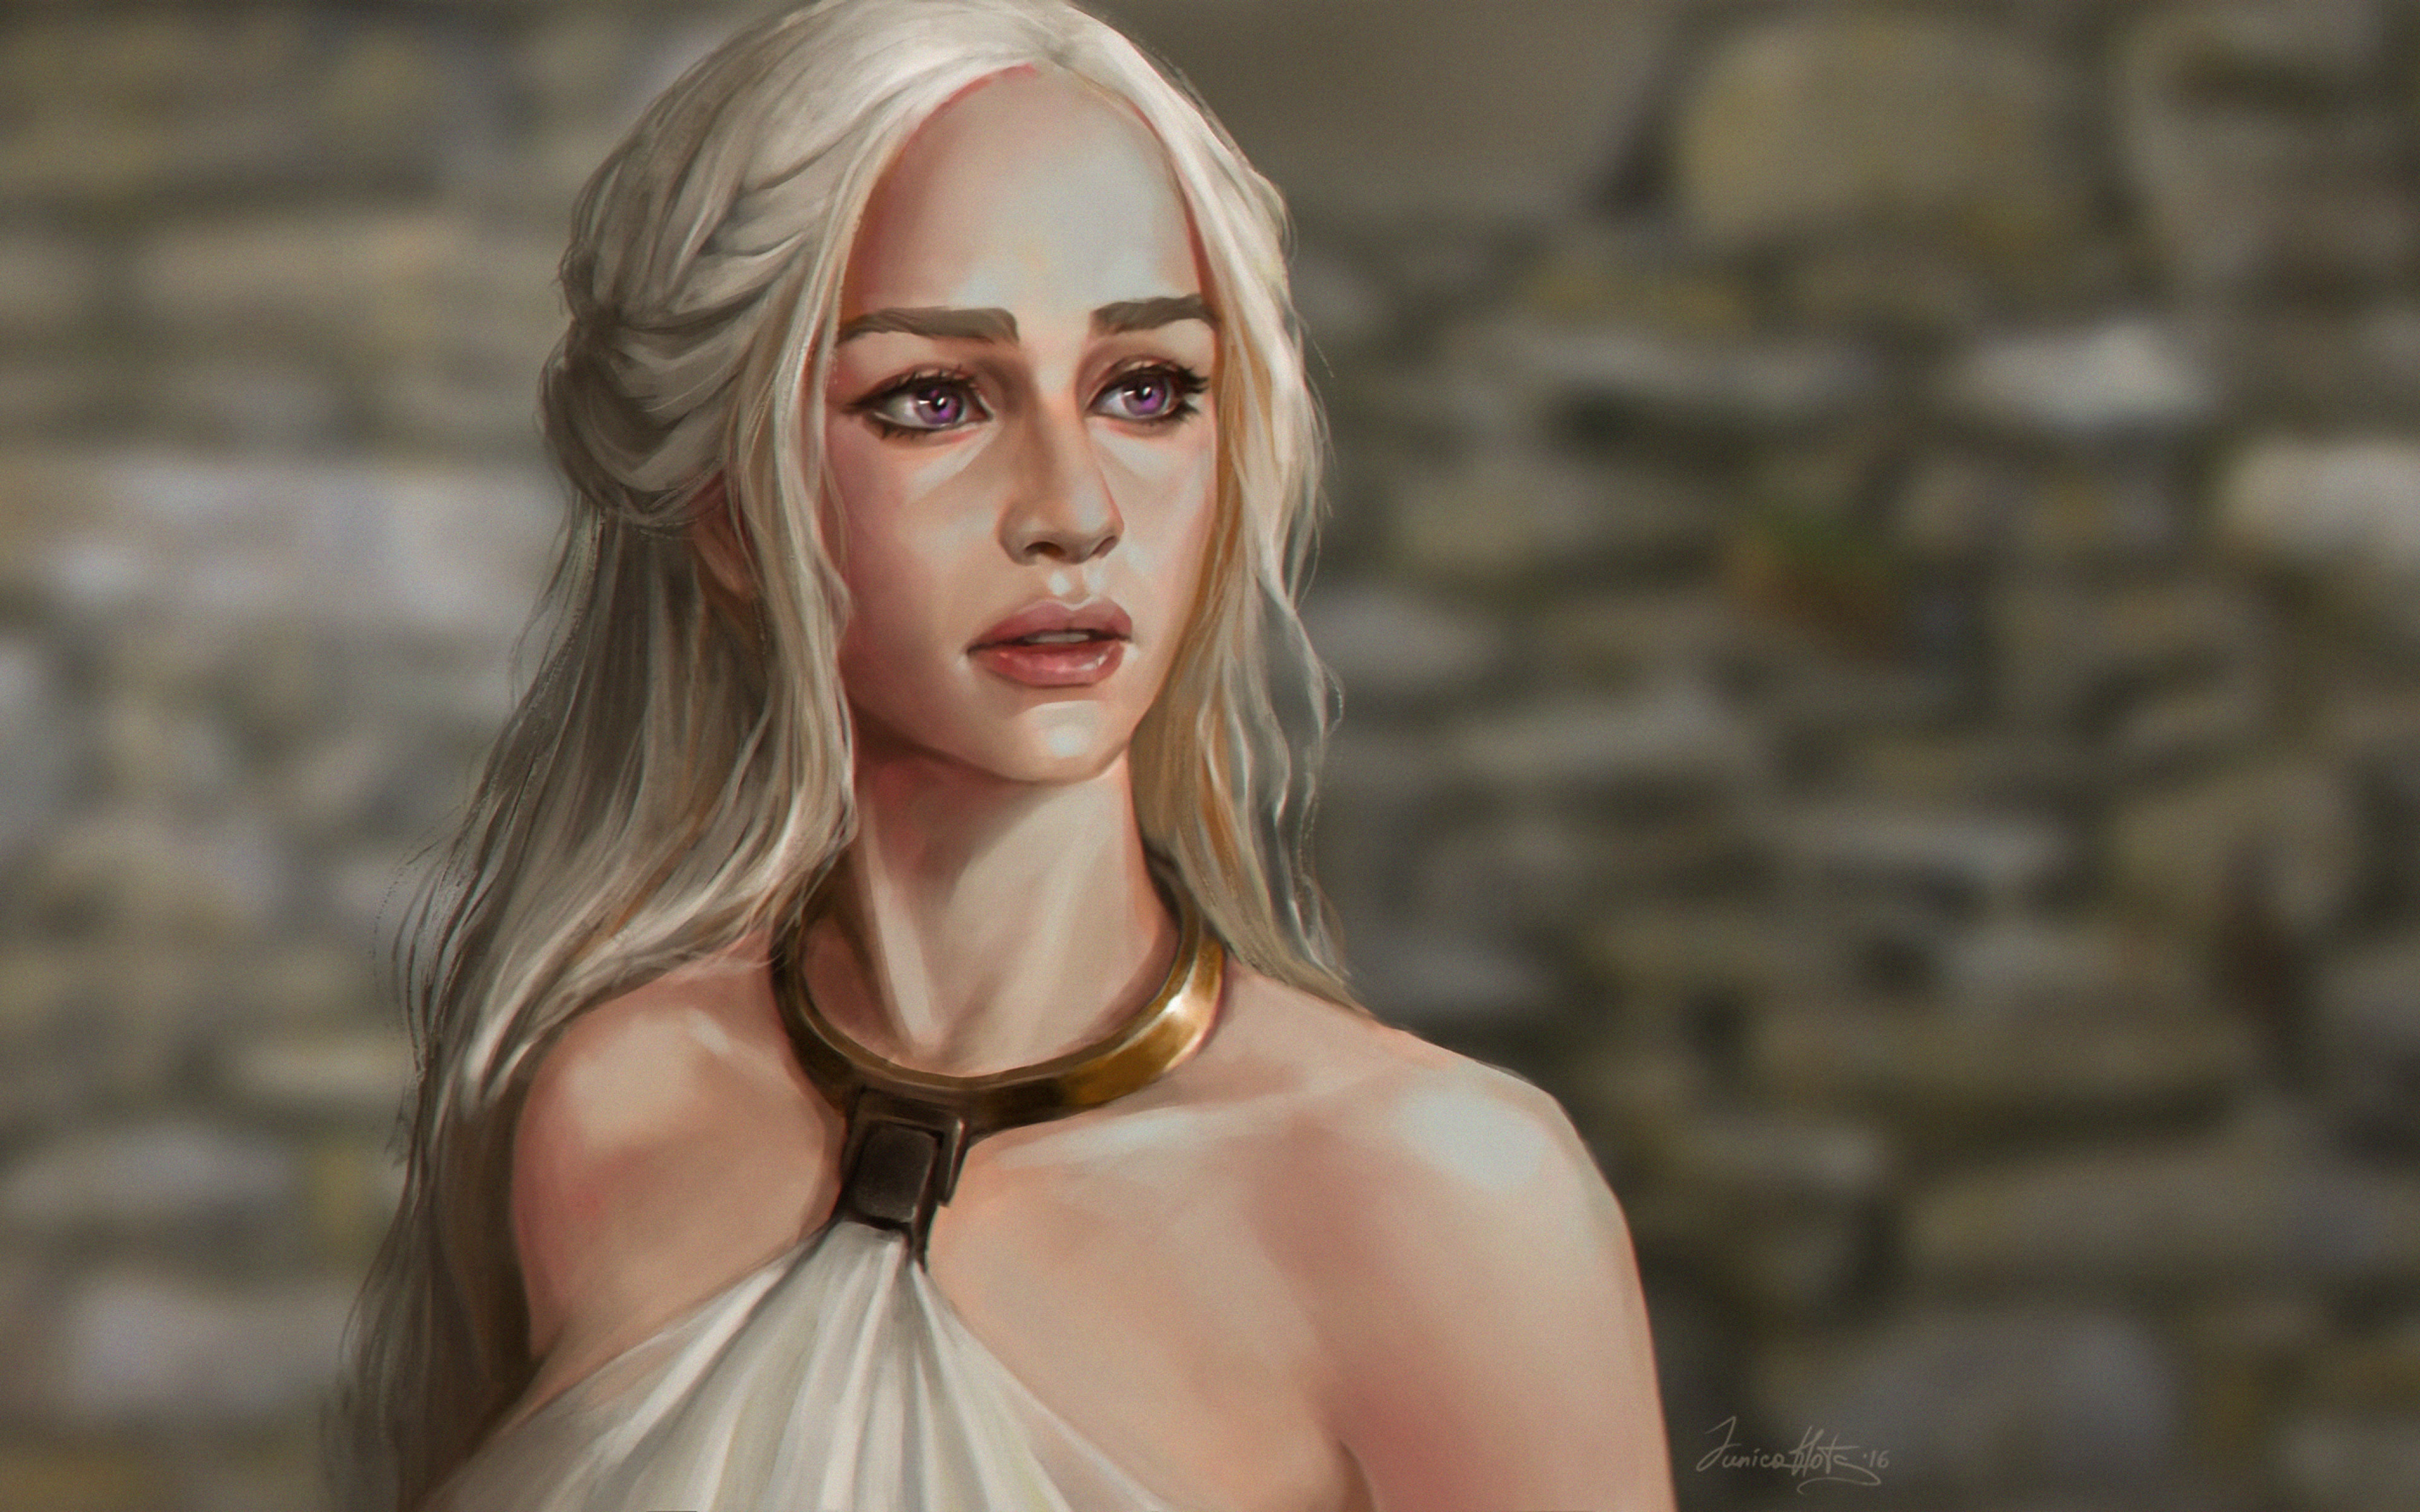 Fondos de pantalla Daenerys Tagaryen Fanart